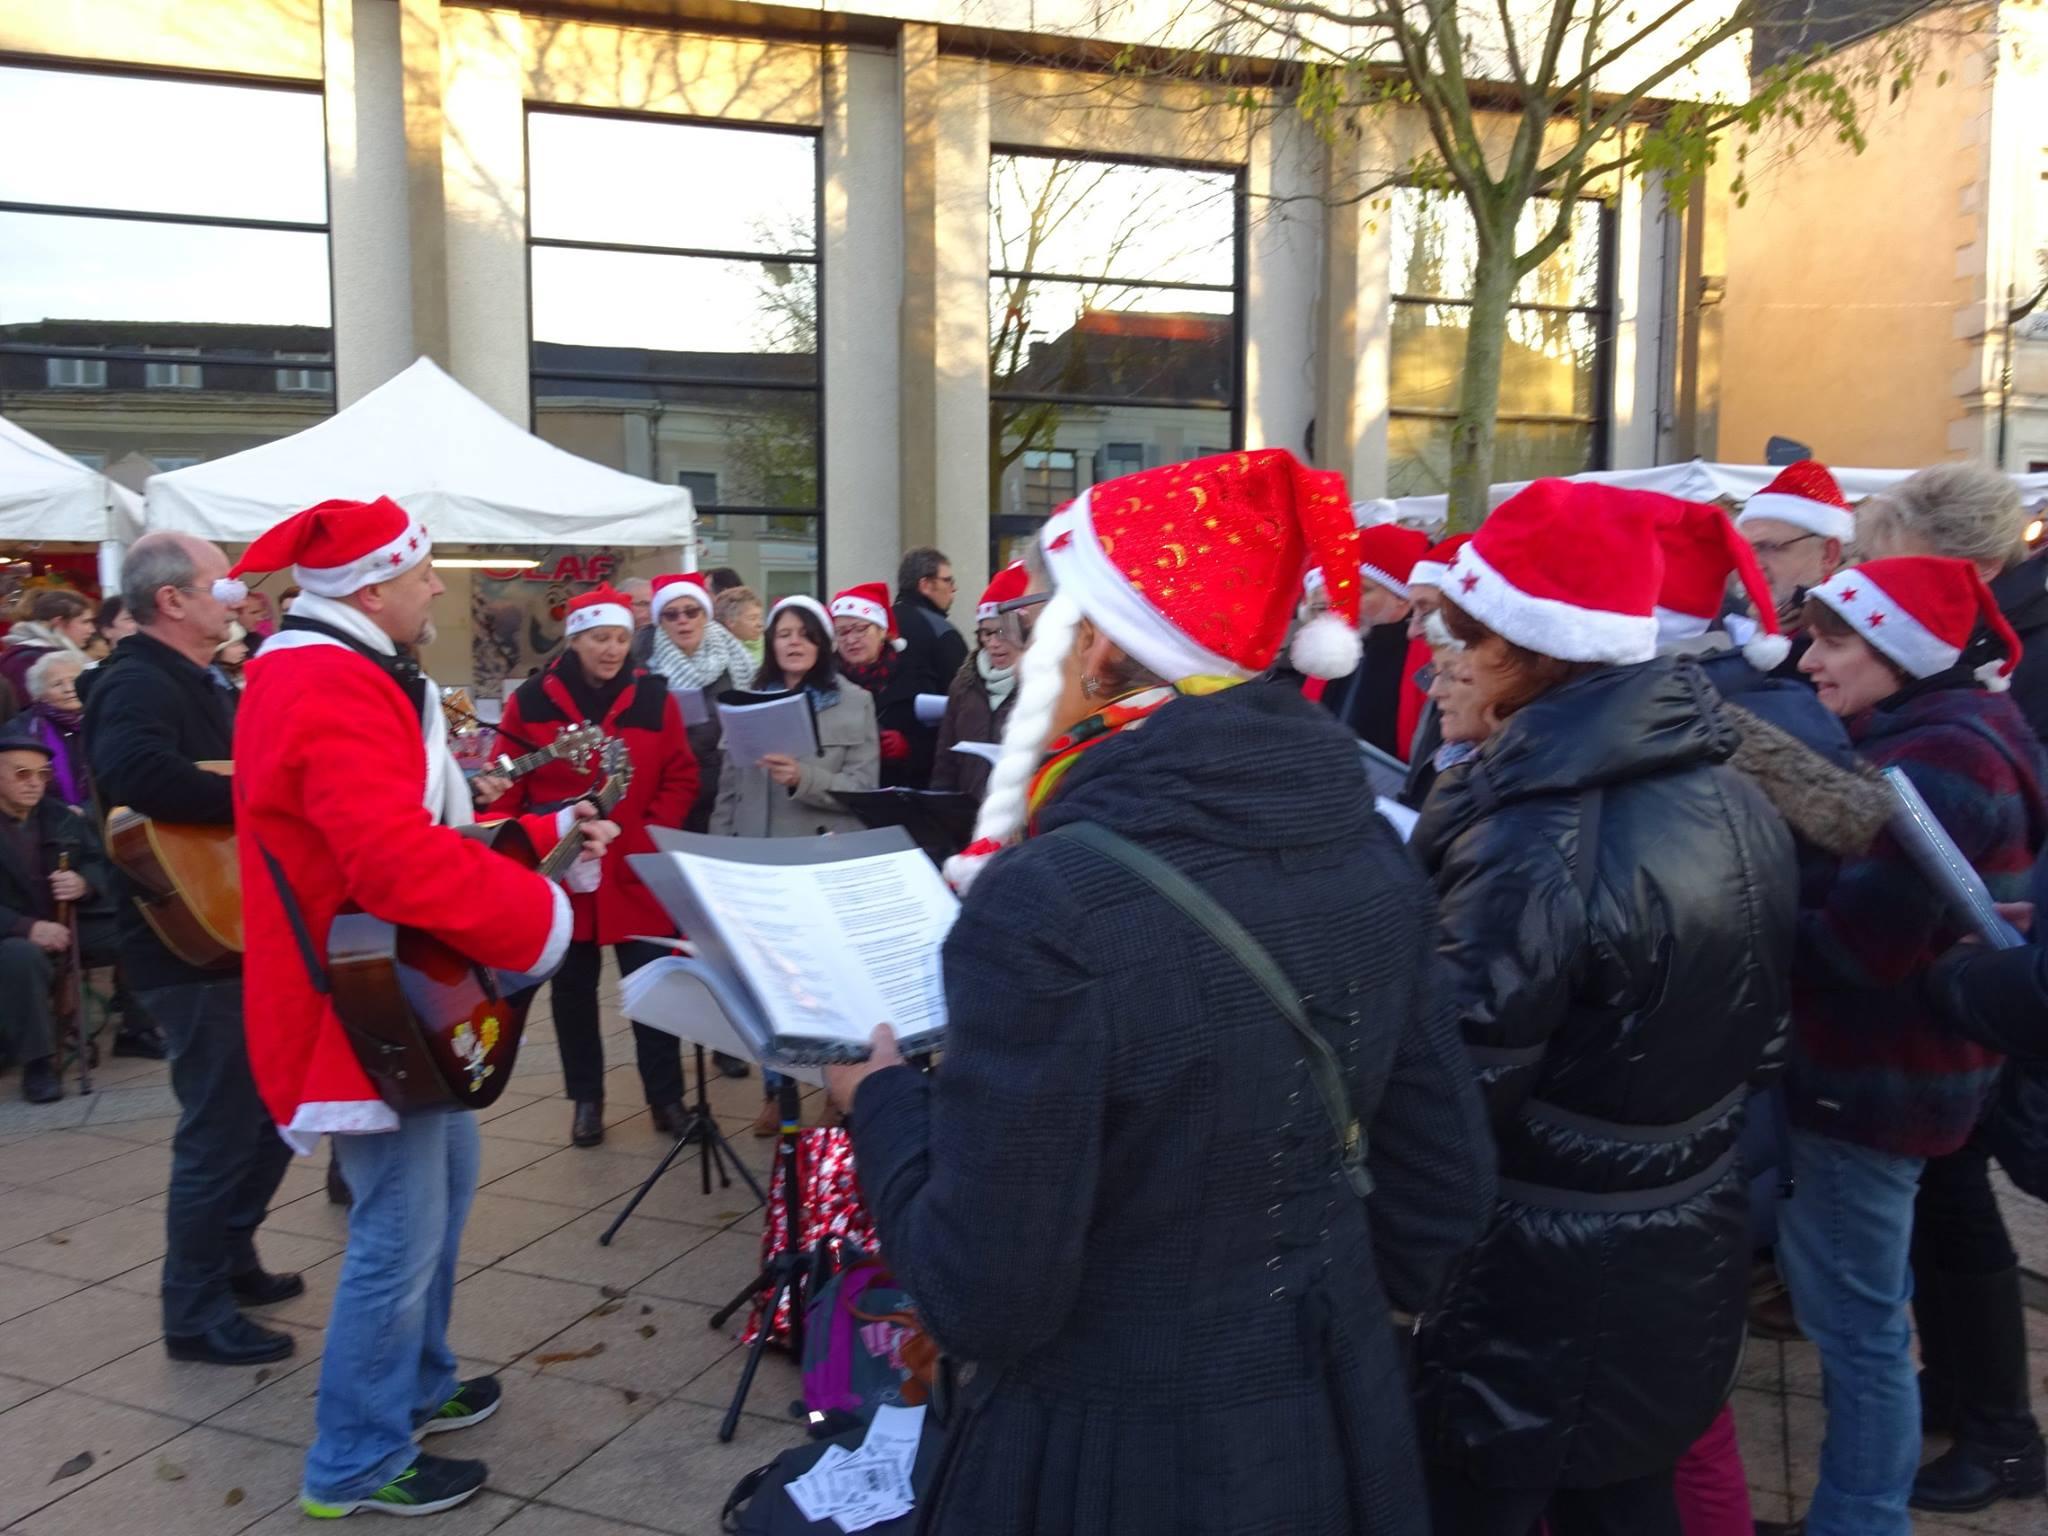 2015-12-12 – Au marché de Noël (2) Sabrina